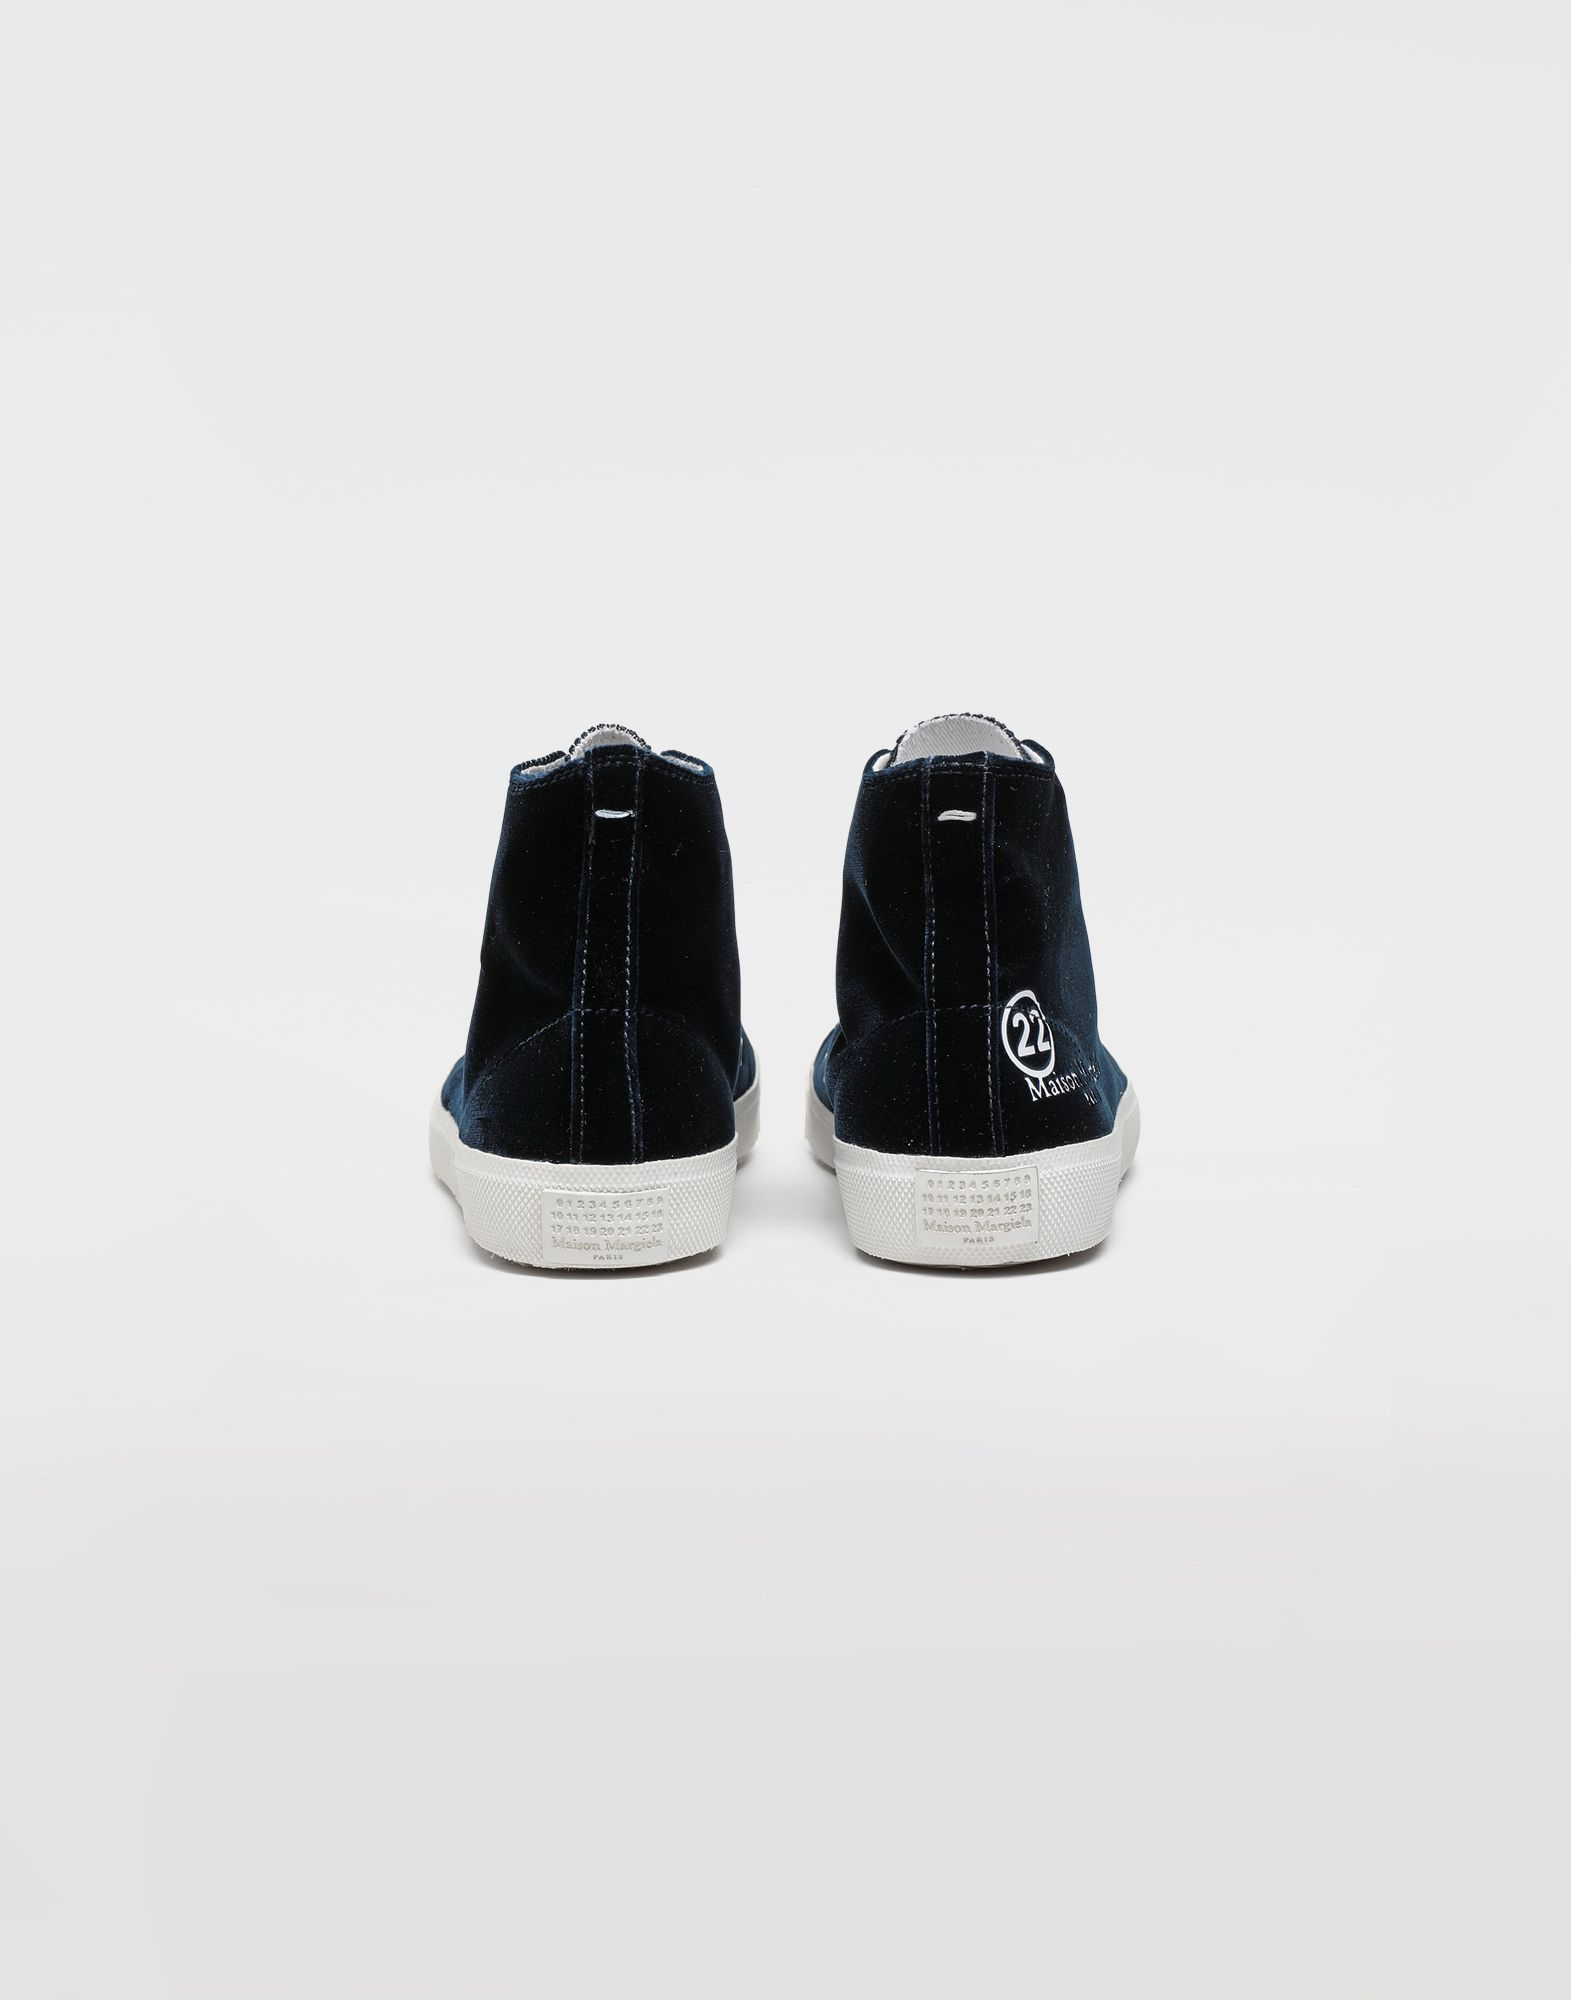 MAISON MARGIELA Tabi high-top velvet sneakers Sneakers Tabi Woman e